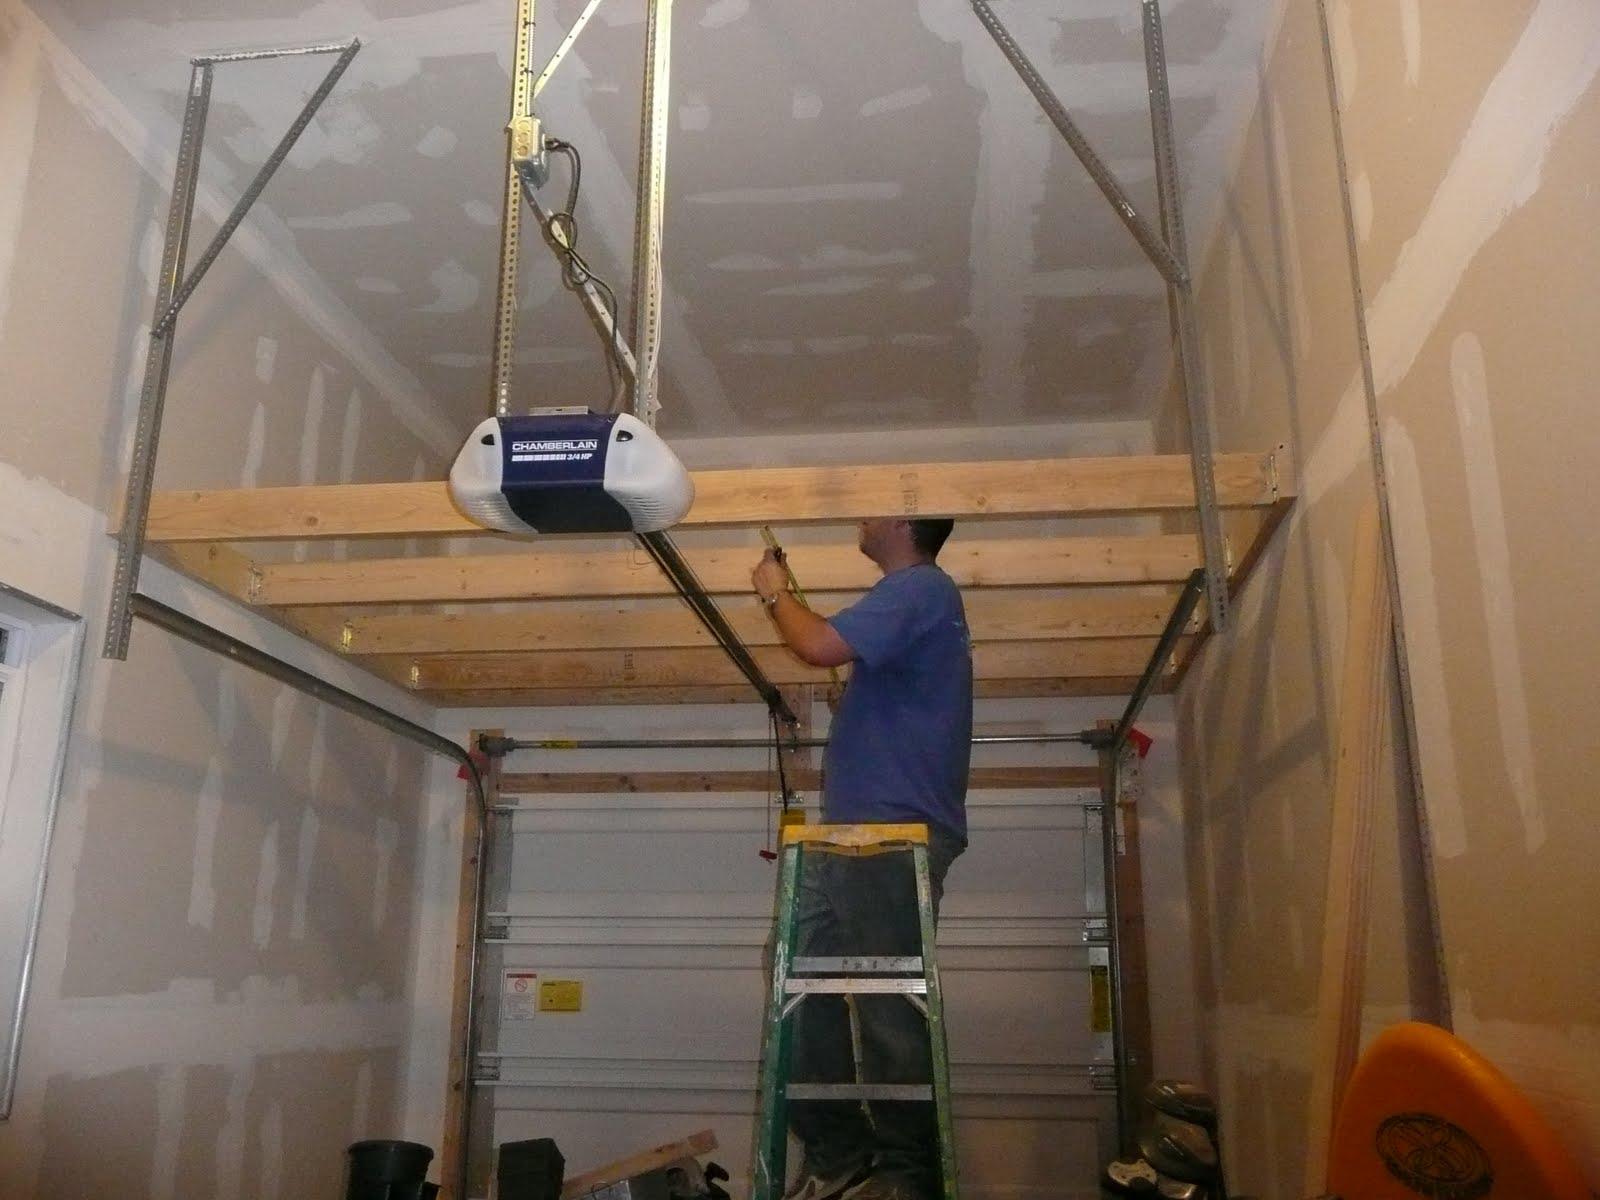 Build Garage Storage Loft Plans DIY Free Download simple twin bunk – Plans To Build A Garage